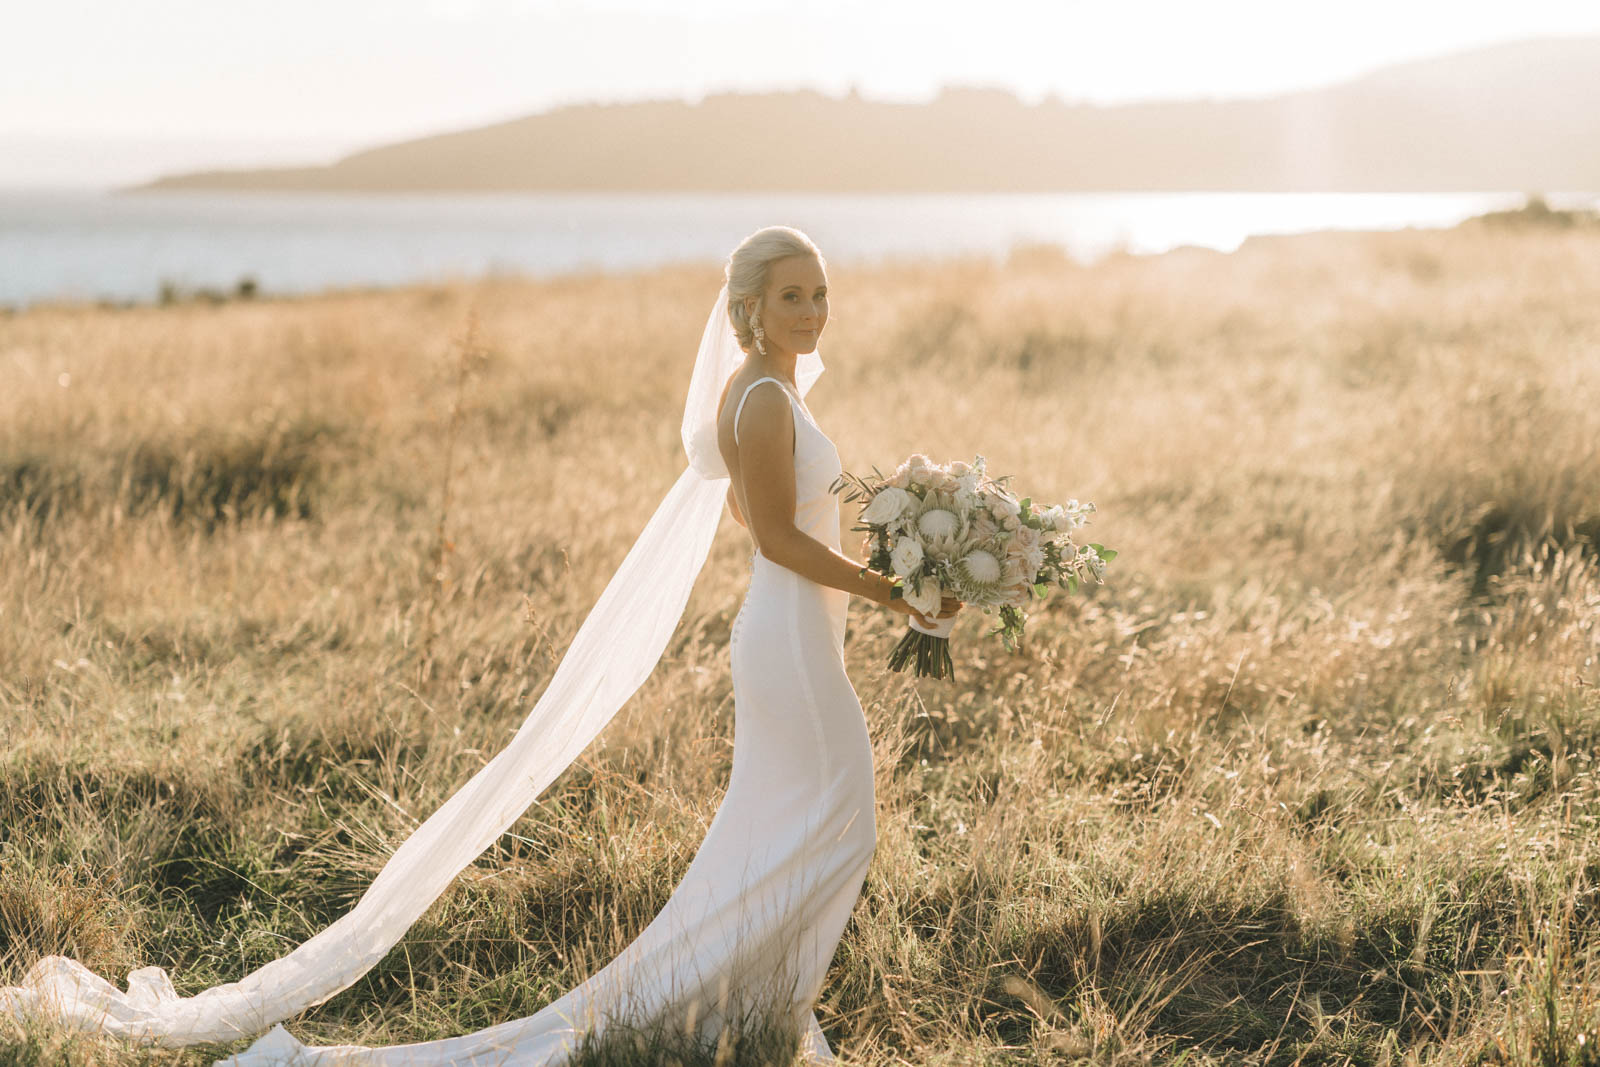 newfound-k-s-hilton-taupo-wedding-photographer-055